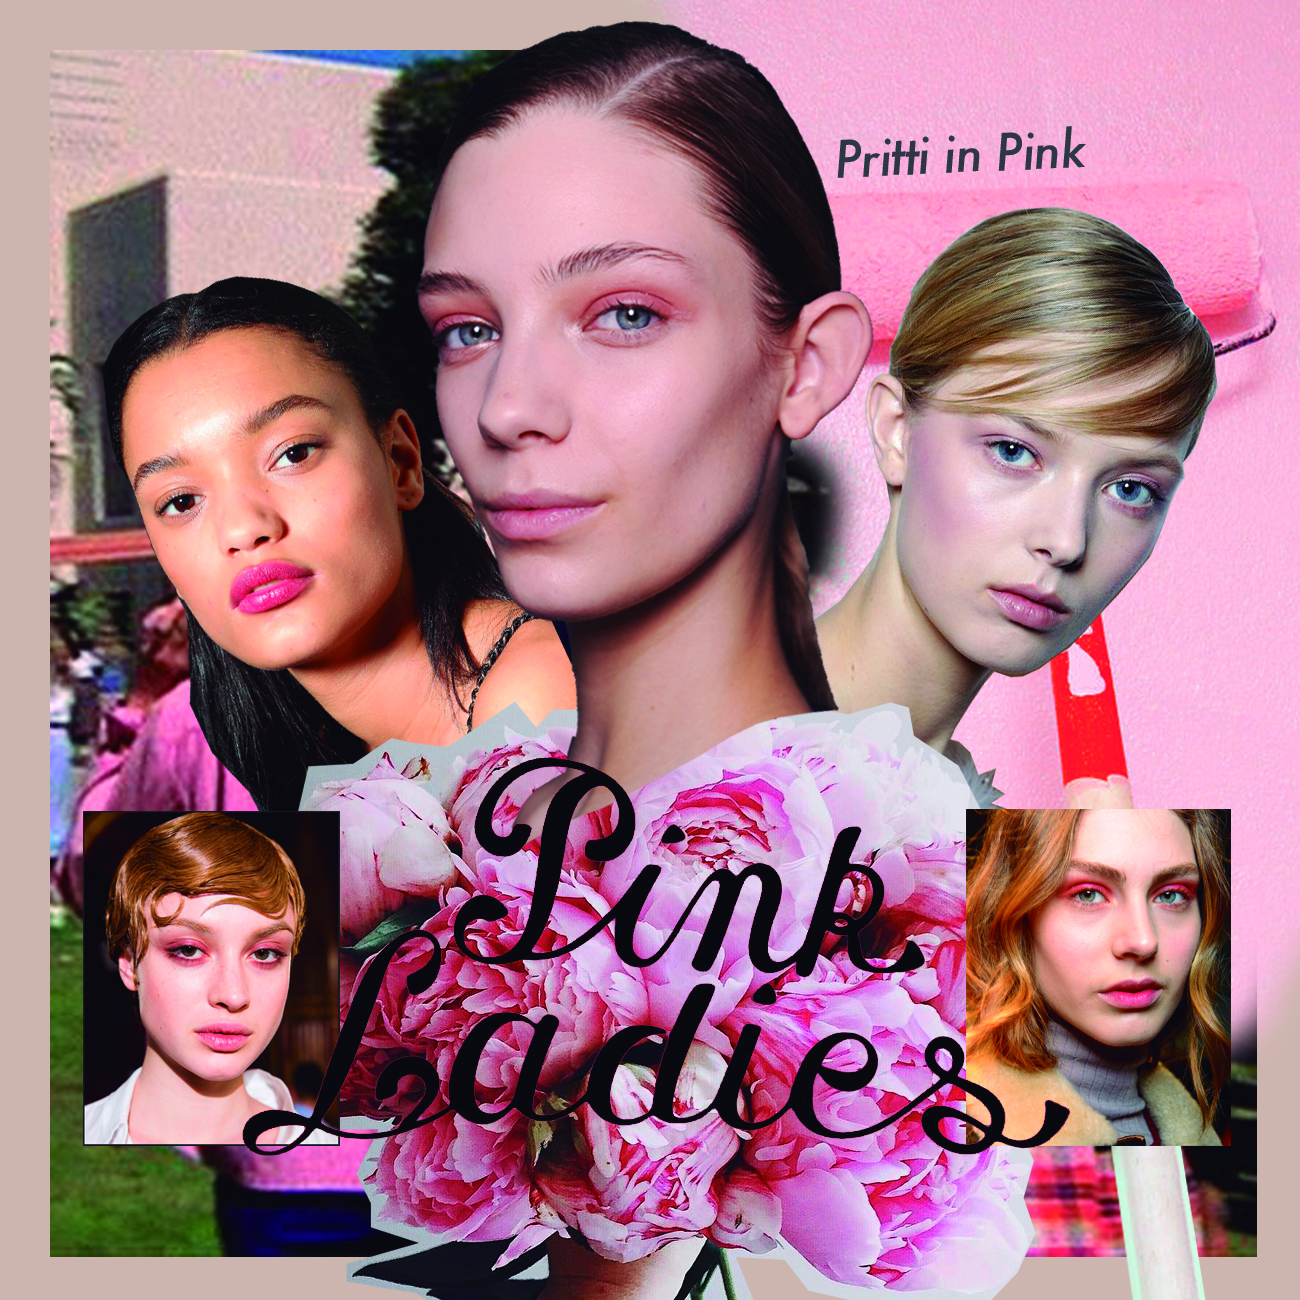 pritti in pink